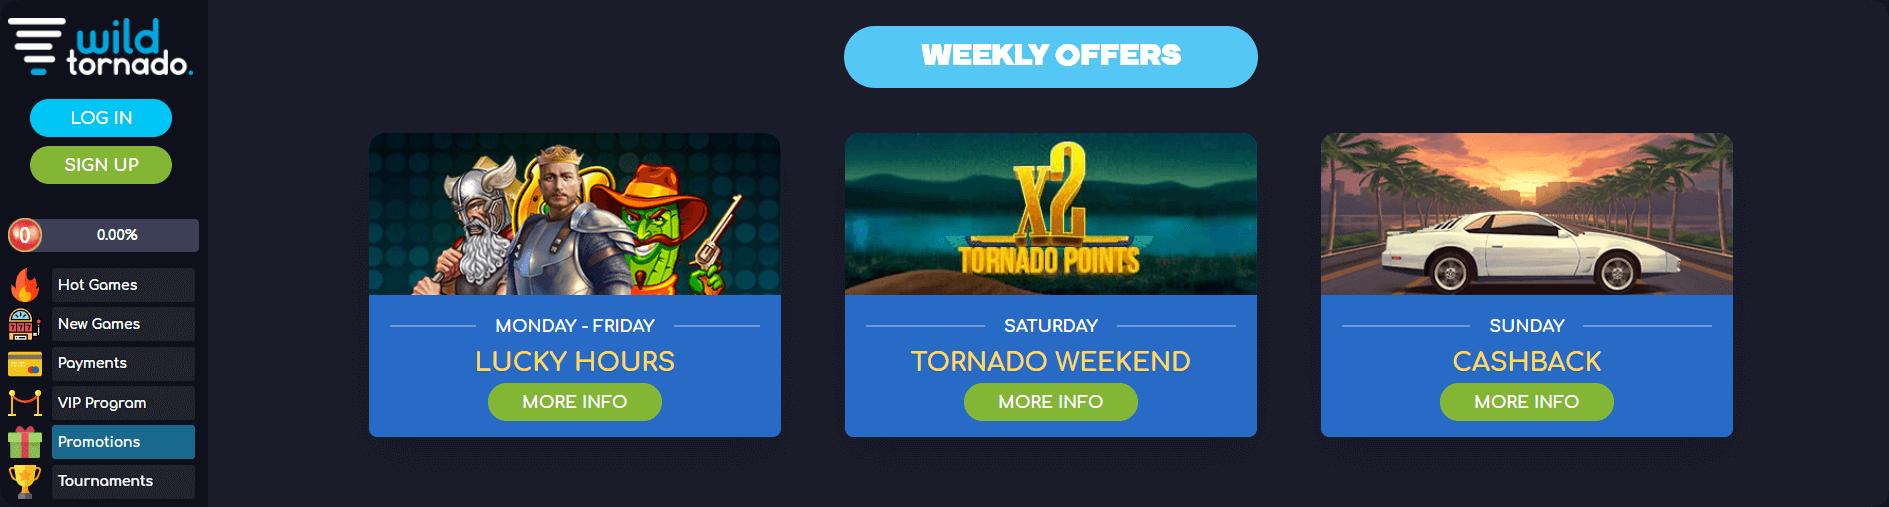 Wild Tornado Promotions